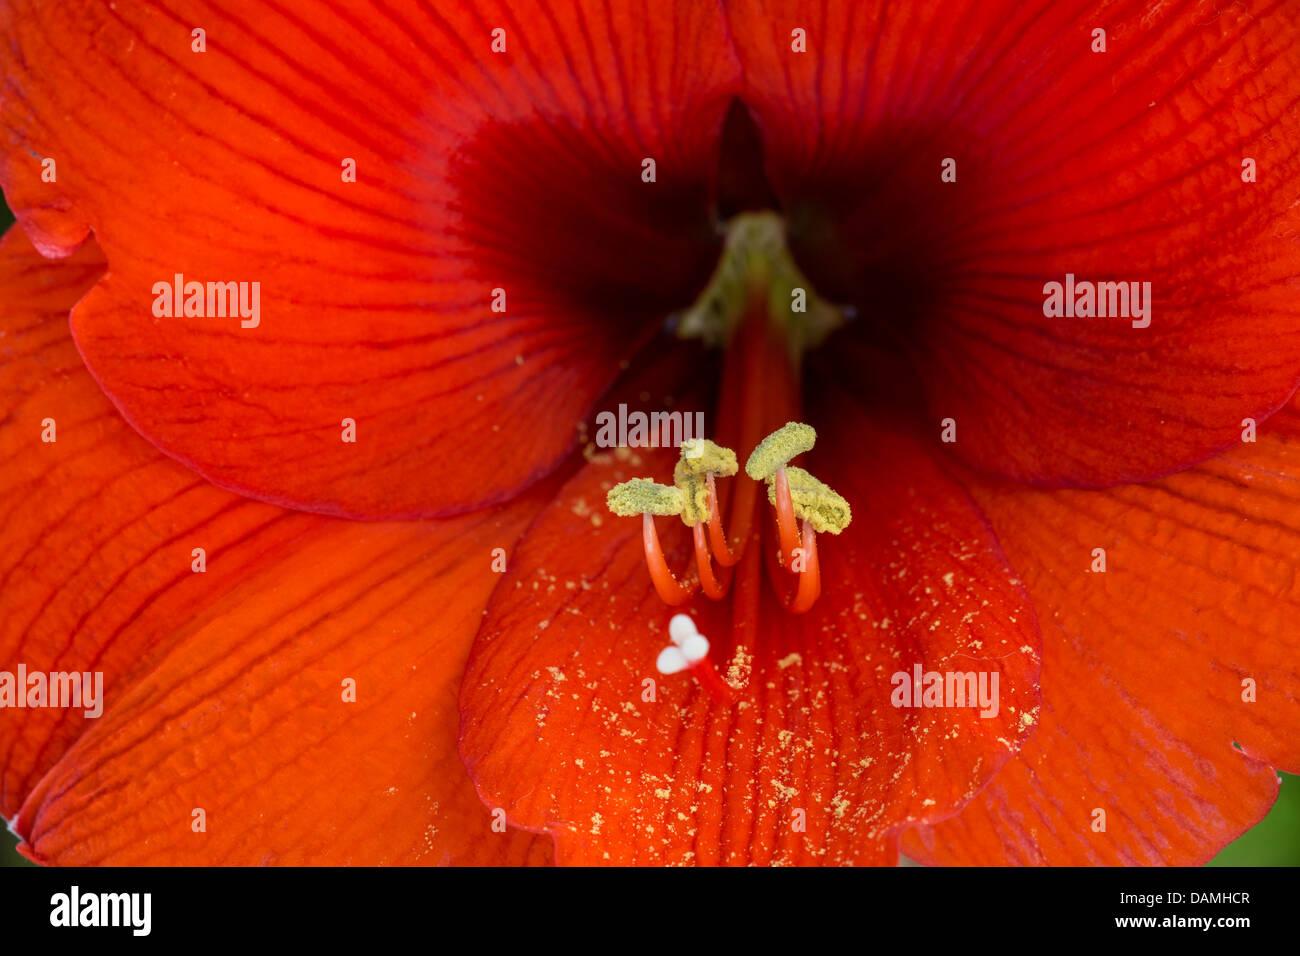 amaryllis (Hippeastrum spec.), flower detail with stamina and stigma - Stock Image